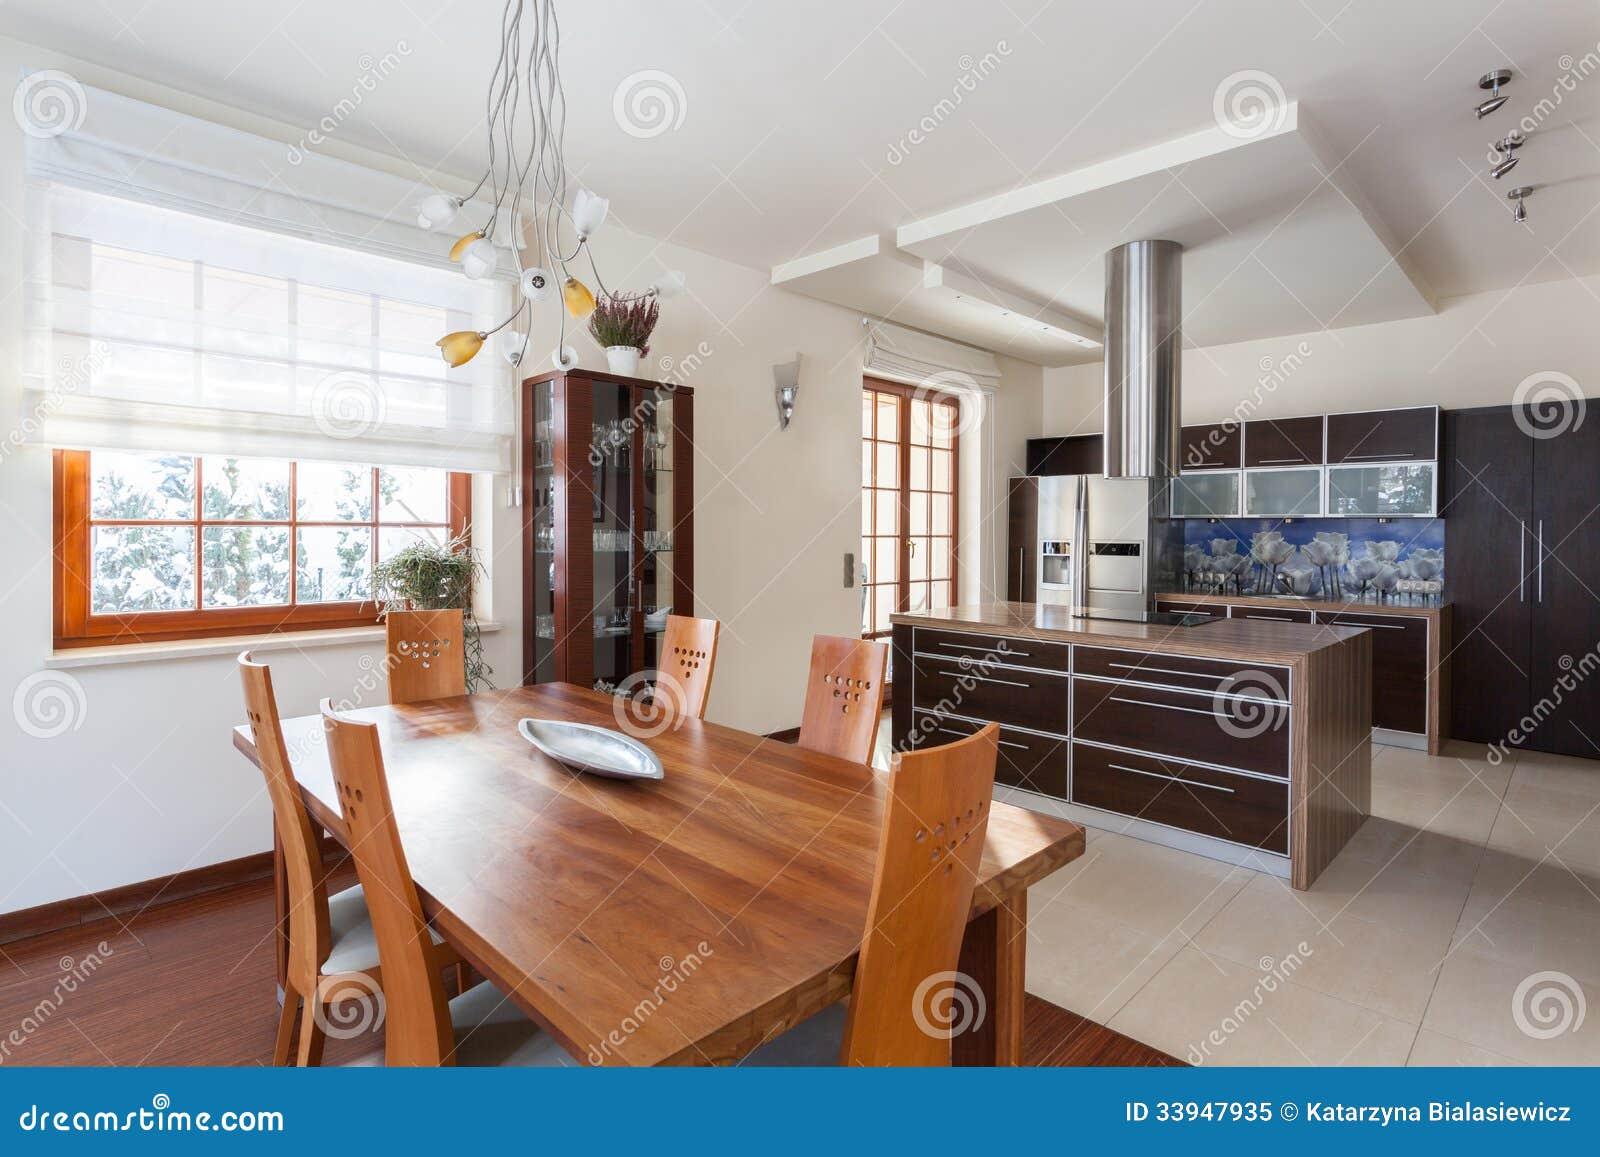 Nuova Cucina Di Casa Di Classe Immagine Stock - Immagine di mobilia ...